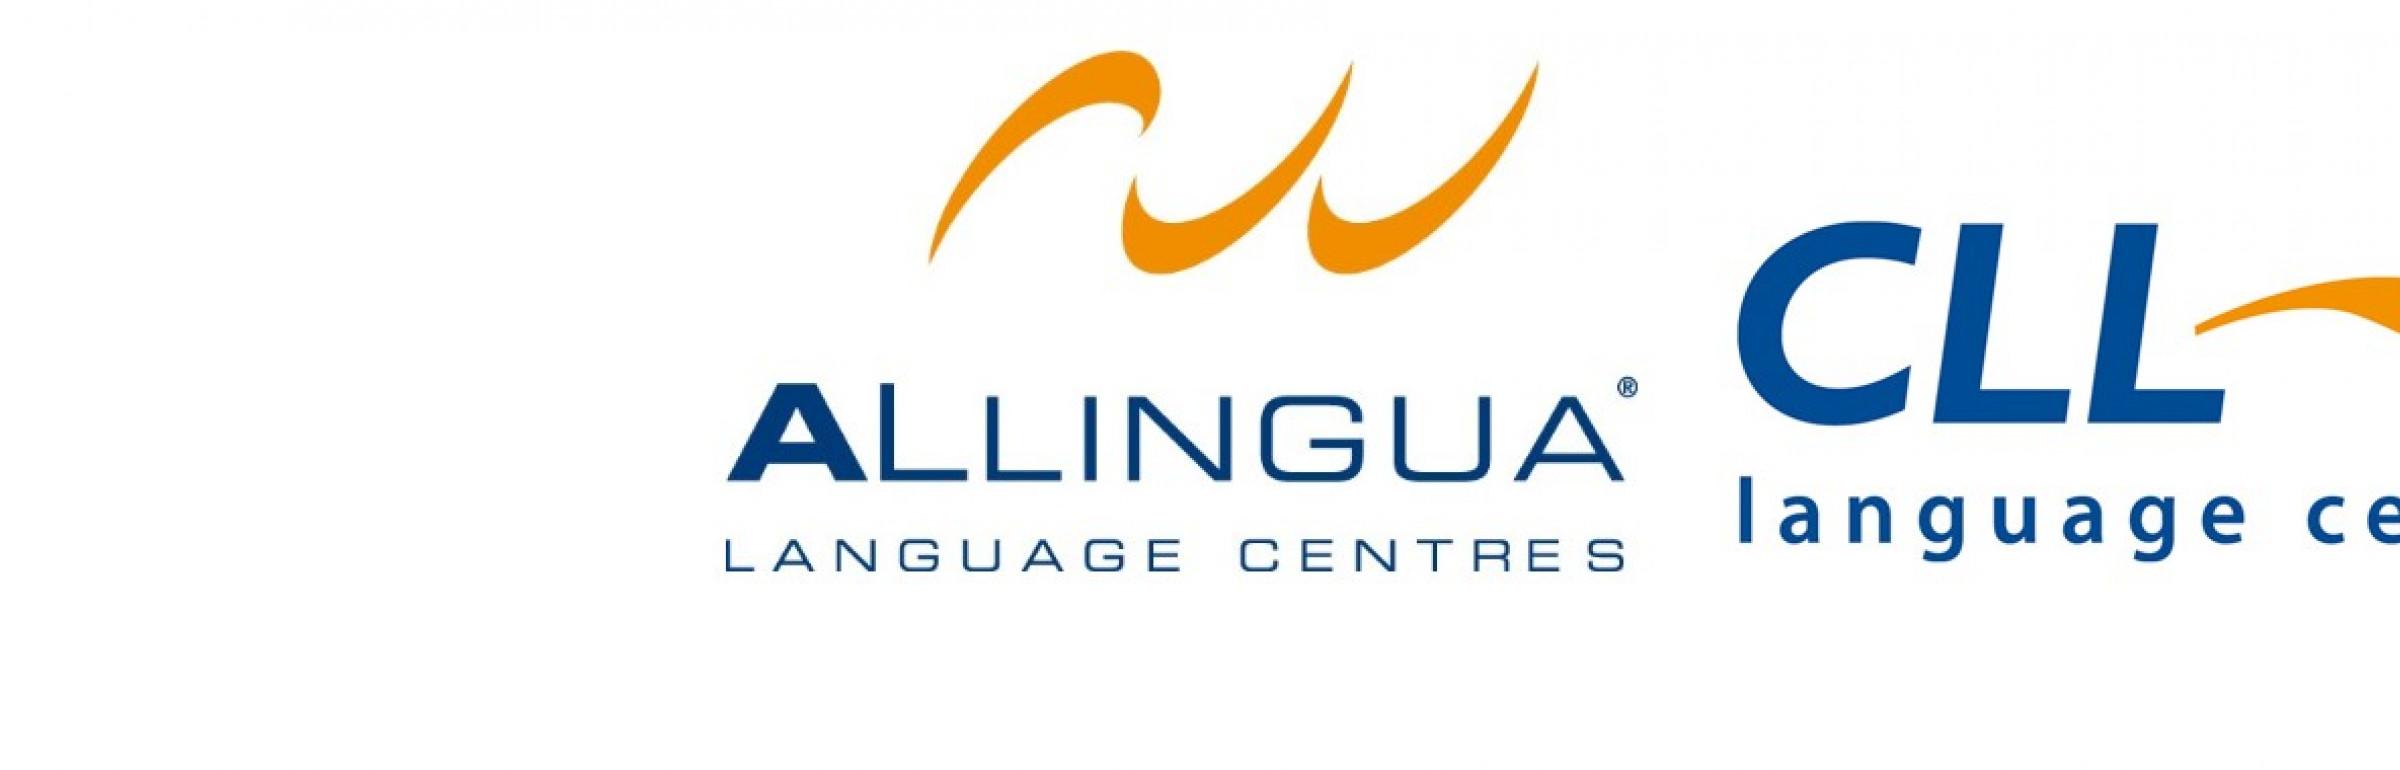 Banner Allingua